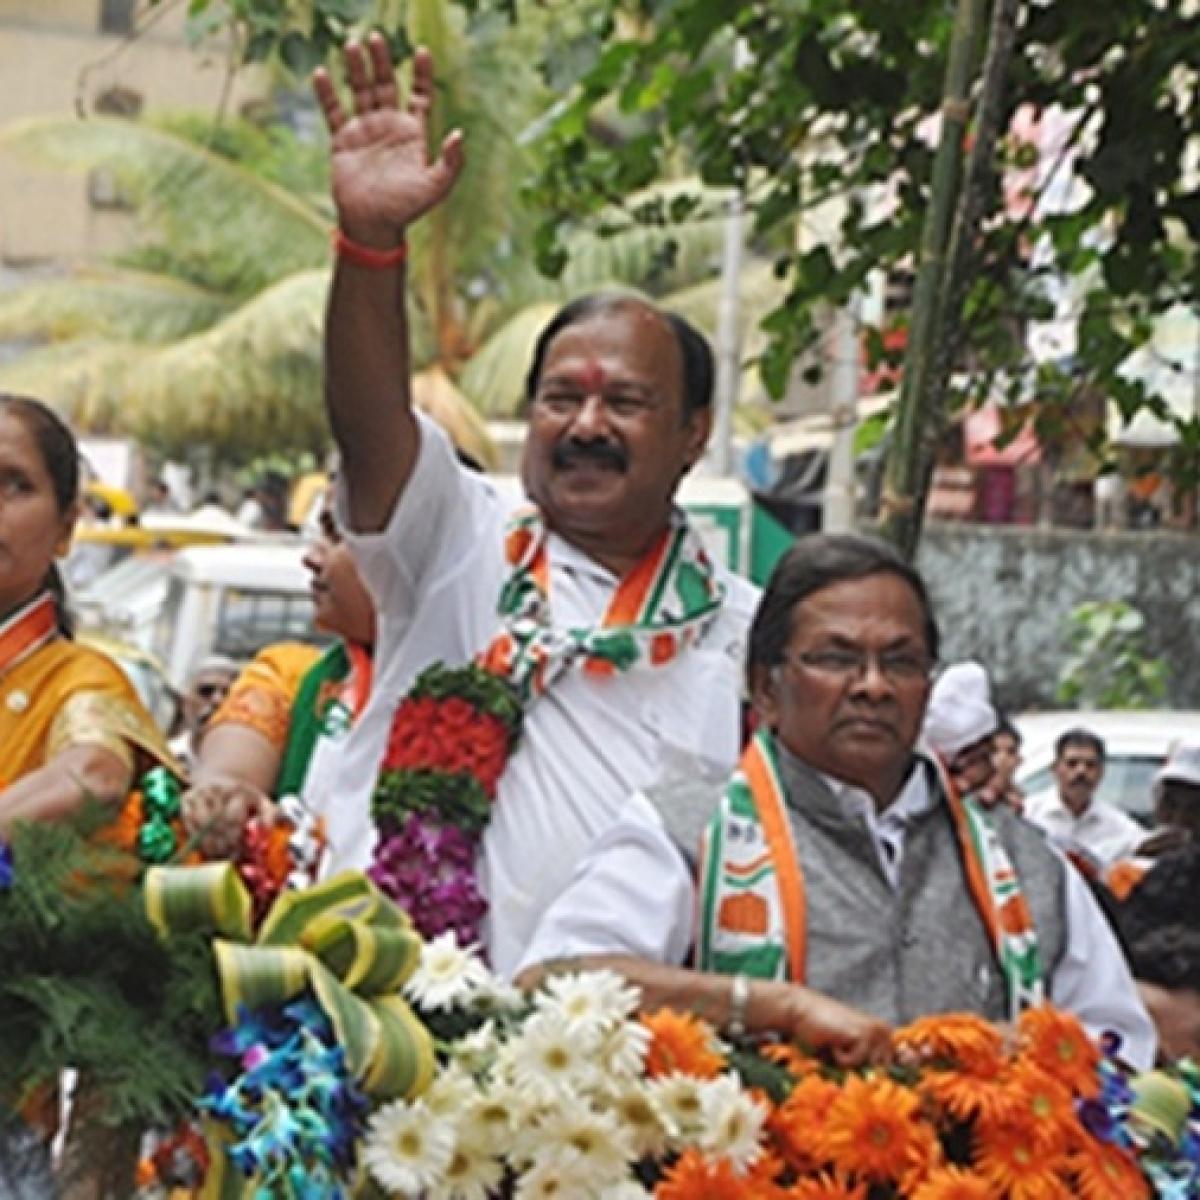 Maharashtra Election 2019 – Wadala Assembly Constituency of Mumbai: BJP's Kalidas Nilkanth Kolambkar wins